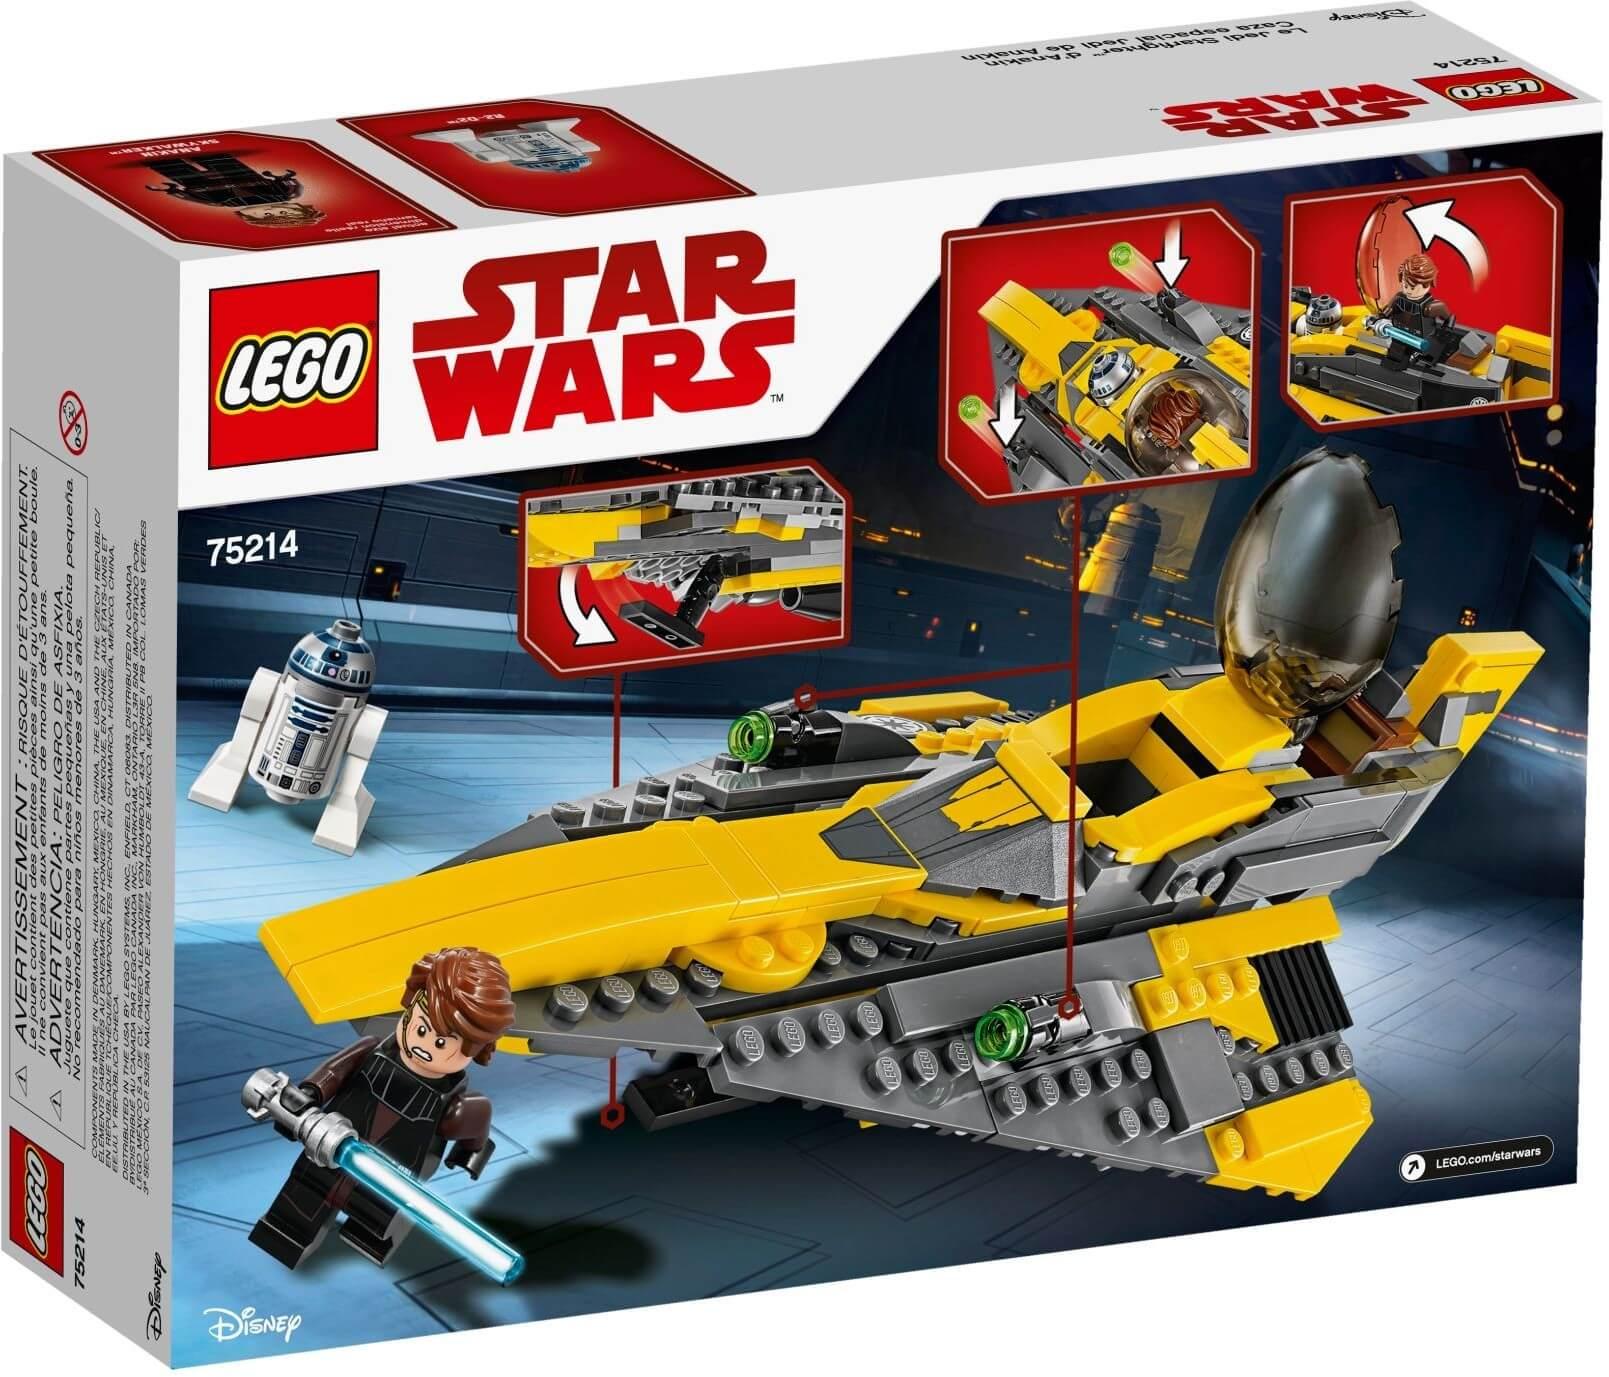 Mua đồ chơi LEGO 75214 - LEGO Star Wars 75214 - Phi Thuyền Jedi của Anakin (LEGO 75214 Anakin's Jedi Starfighter)